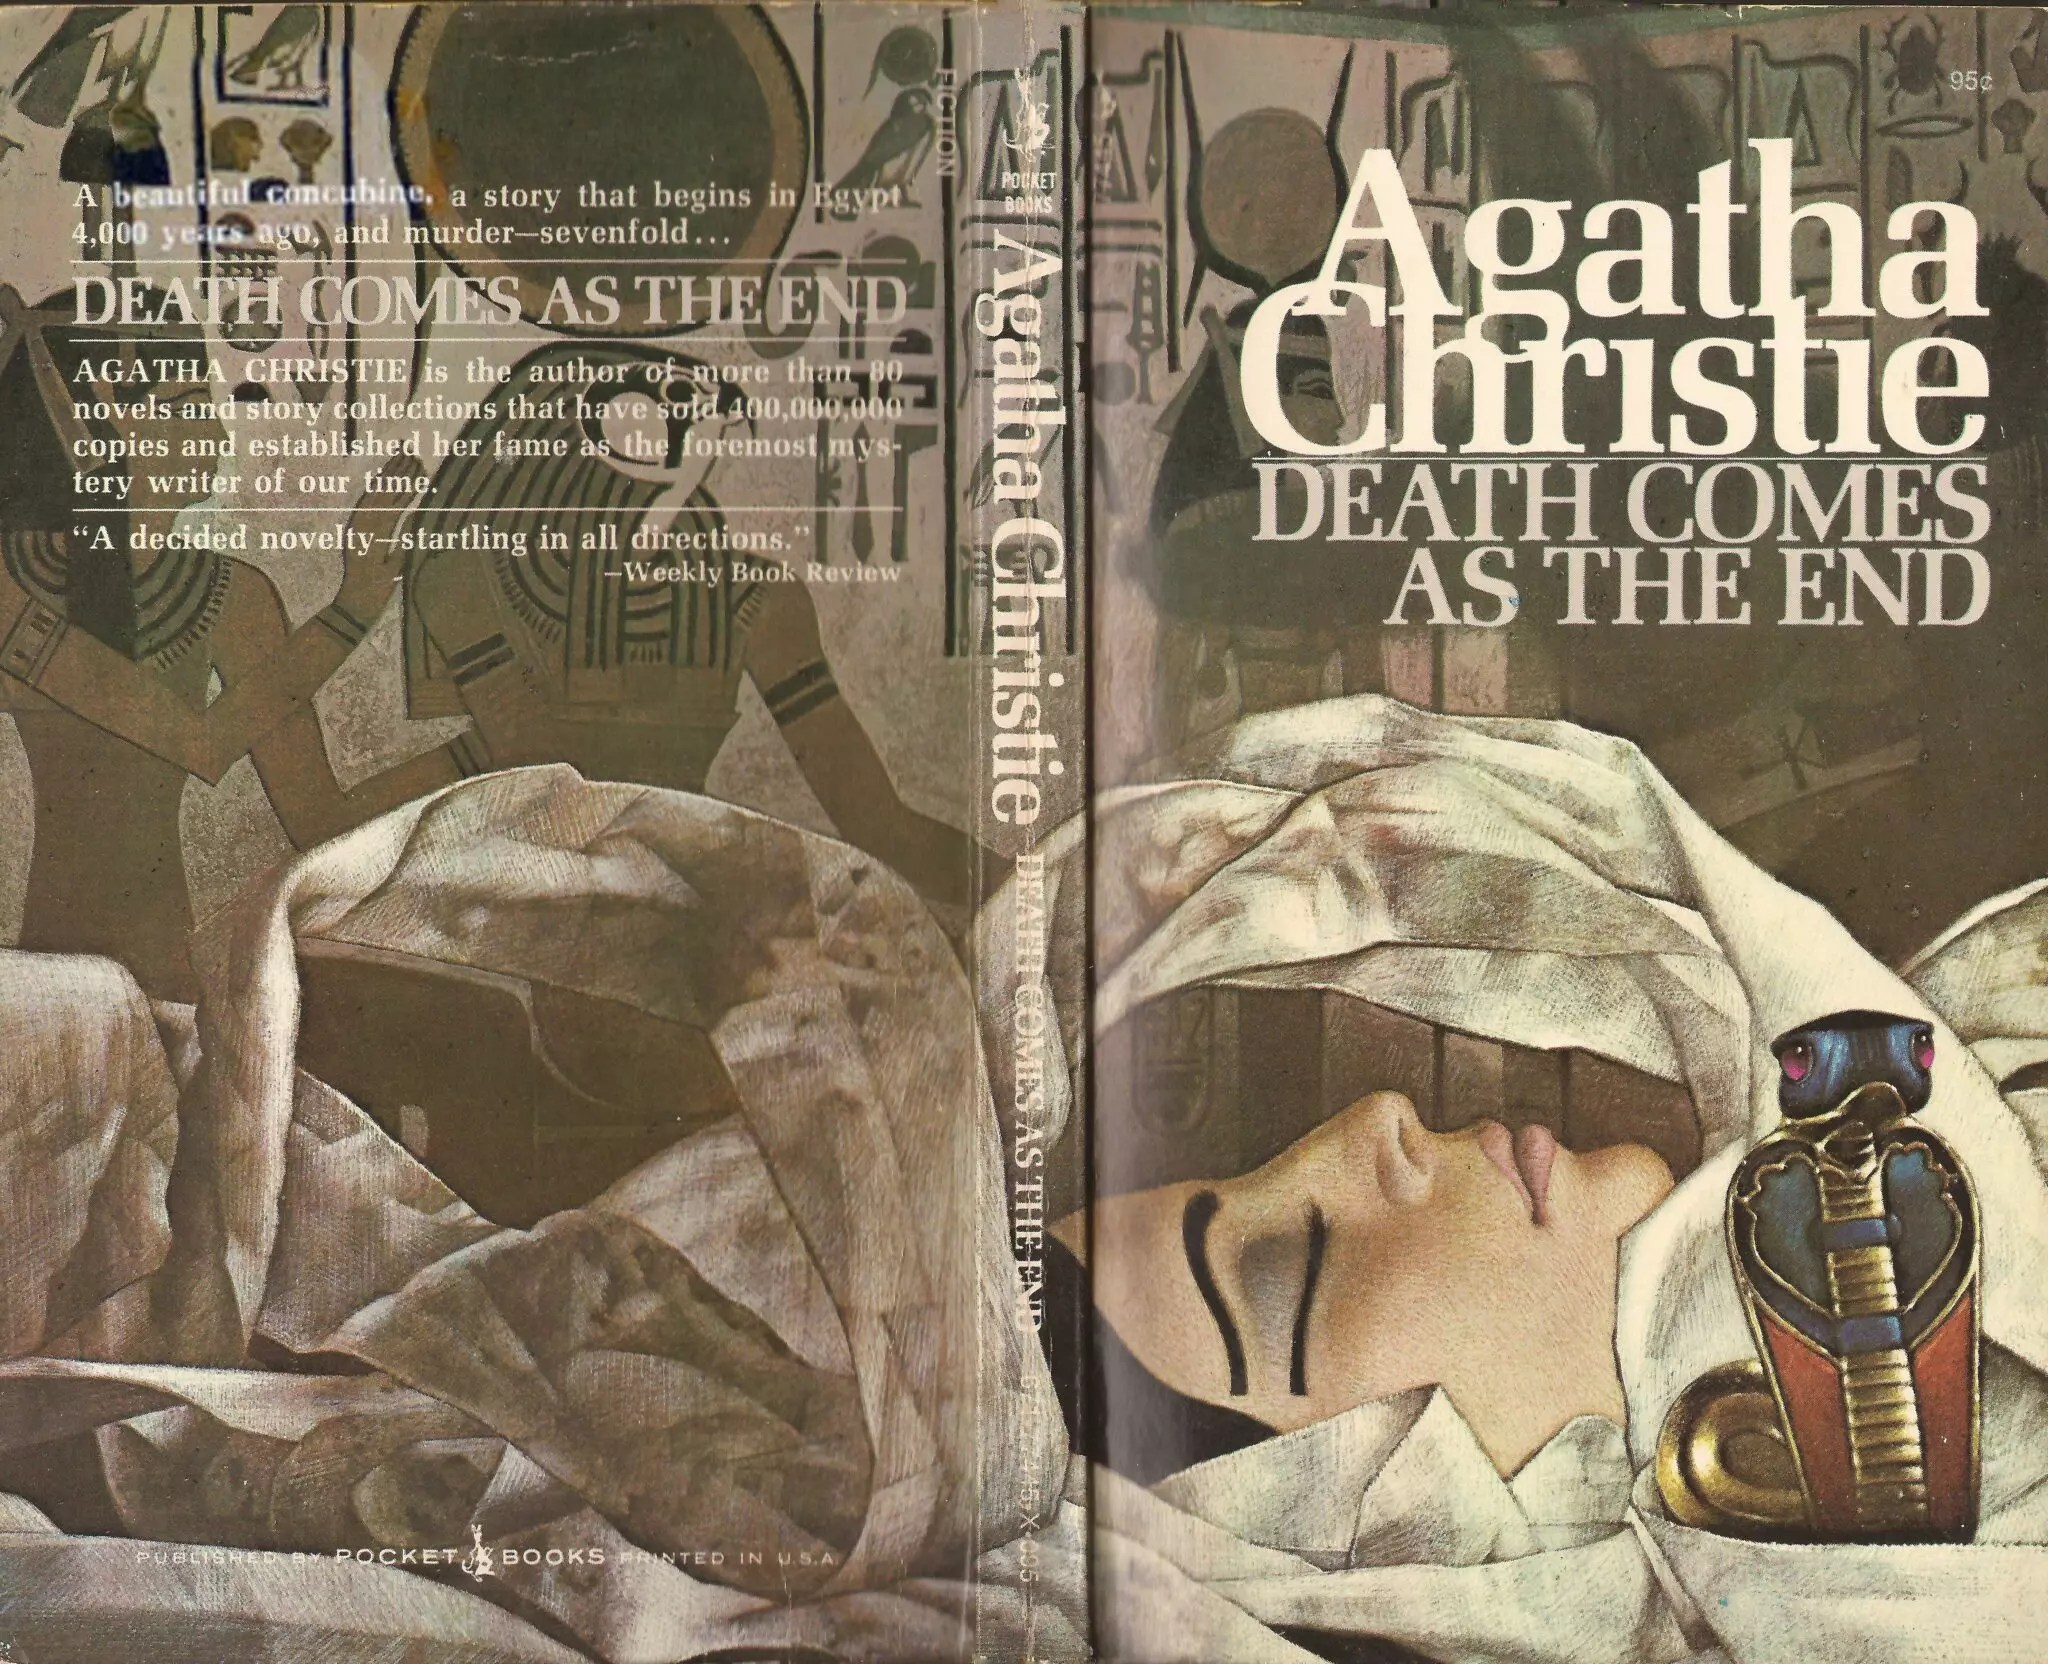 Agatha Christie Tom Adams Death Comes as the End Pocket Books 3